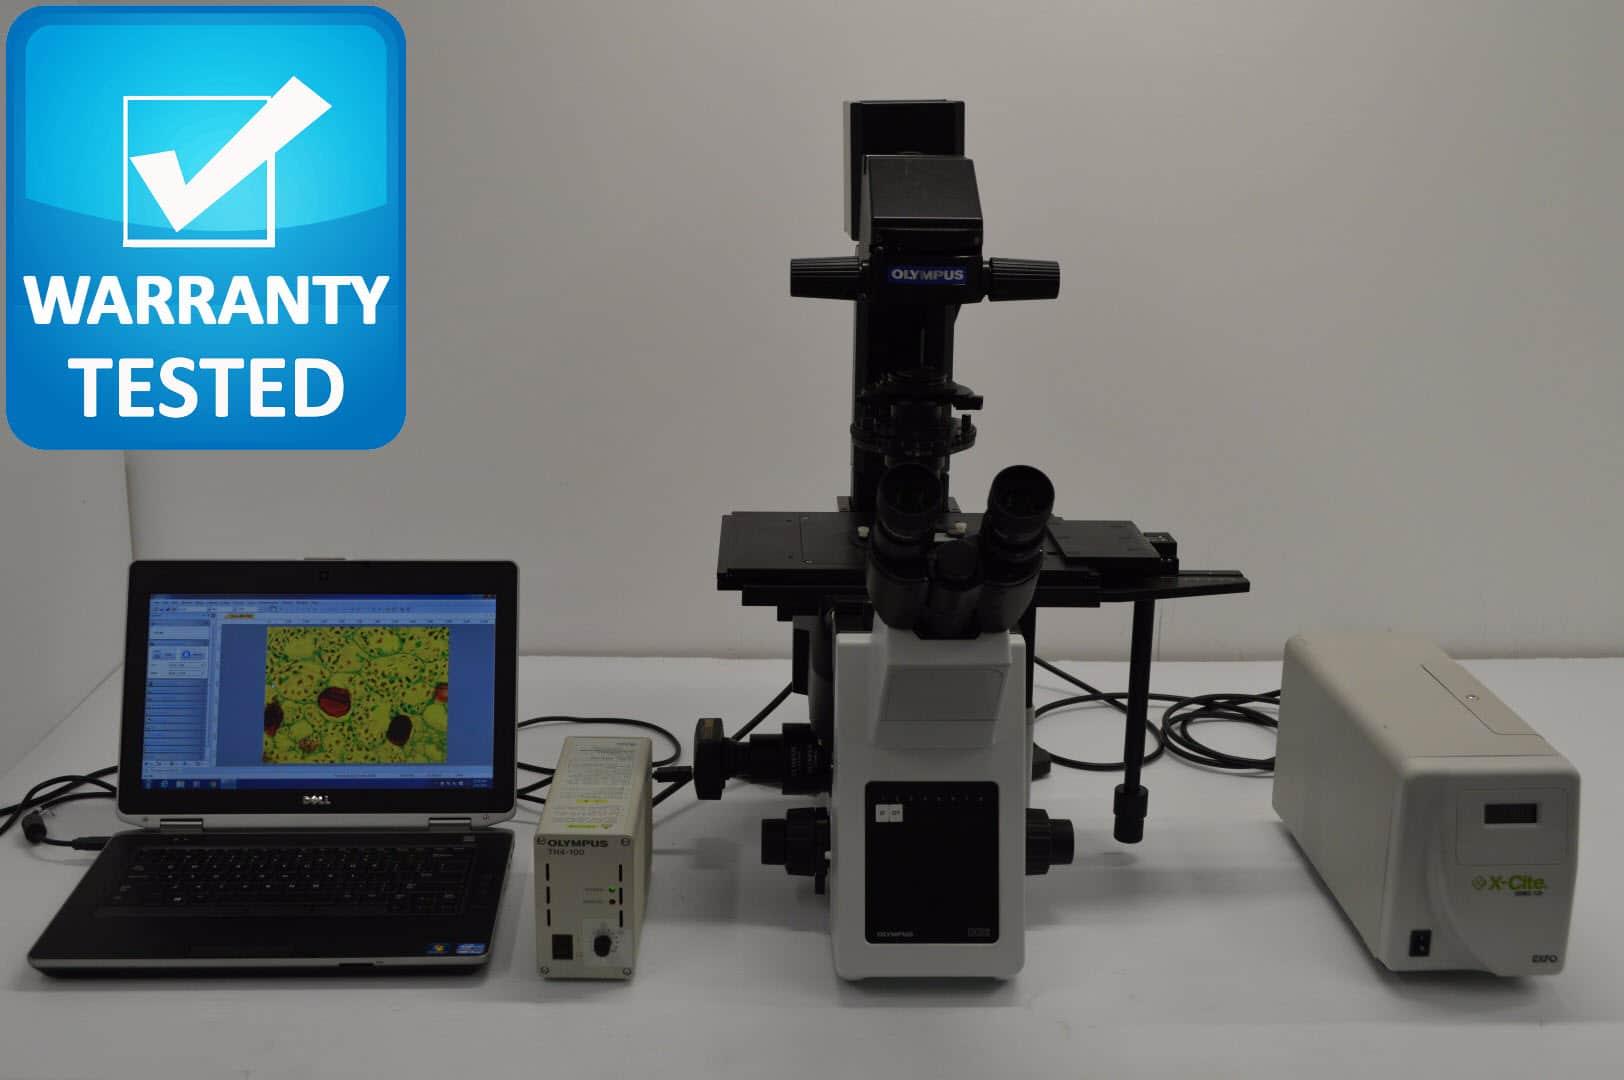 Olympus IX53 Inverted Fluorescence Microscope